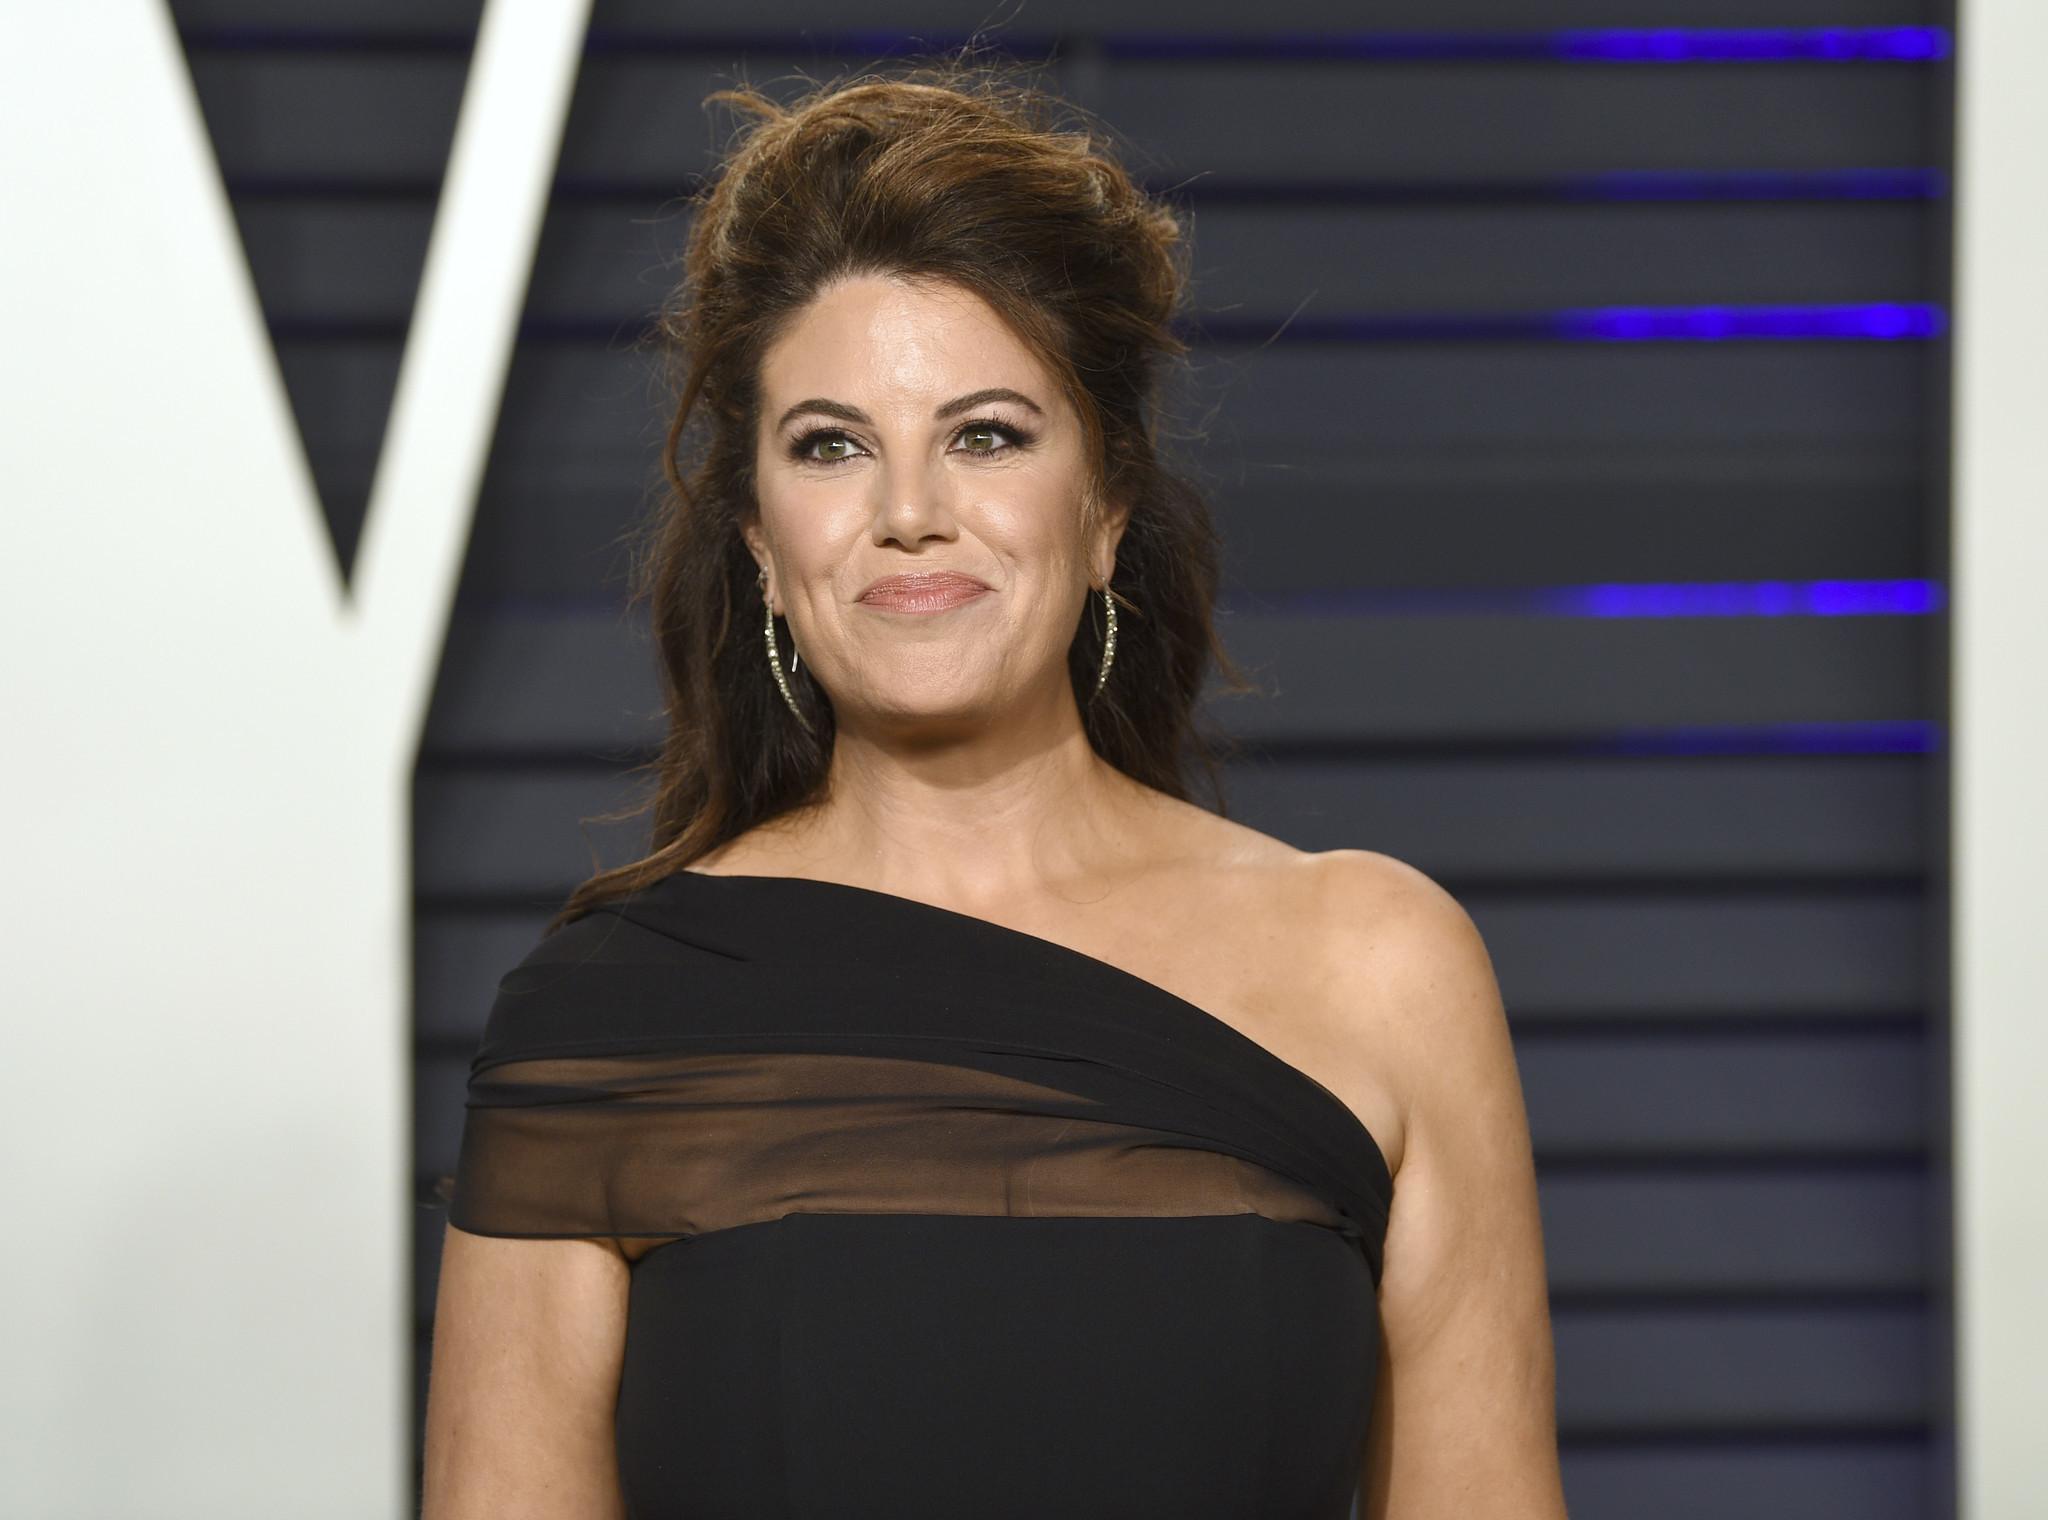 Monica Lewinsky will produce 'American Crime Story' Season 3 on Clinton impeachment